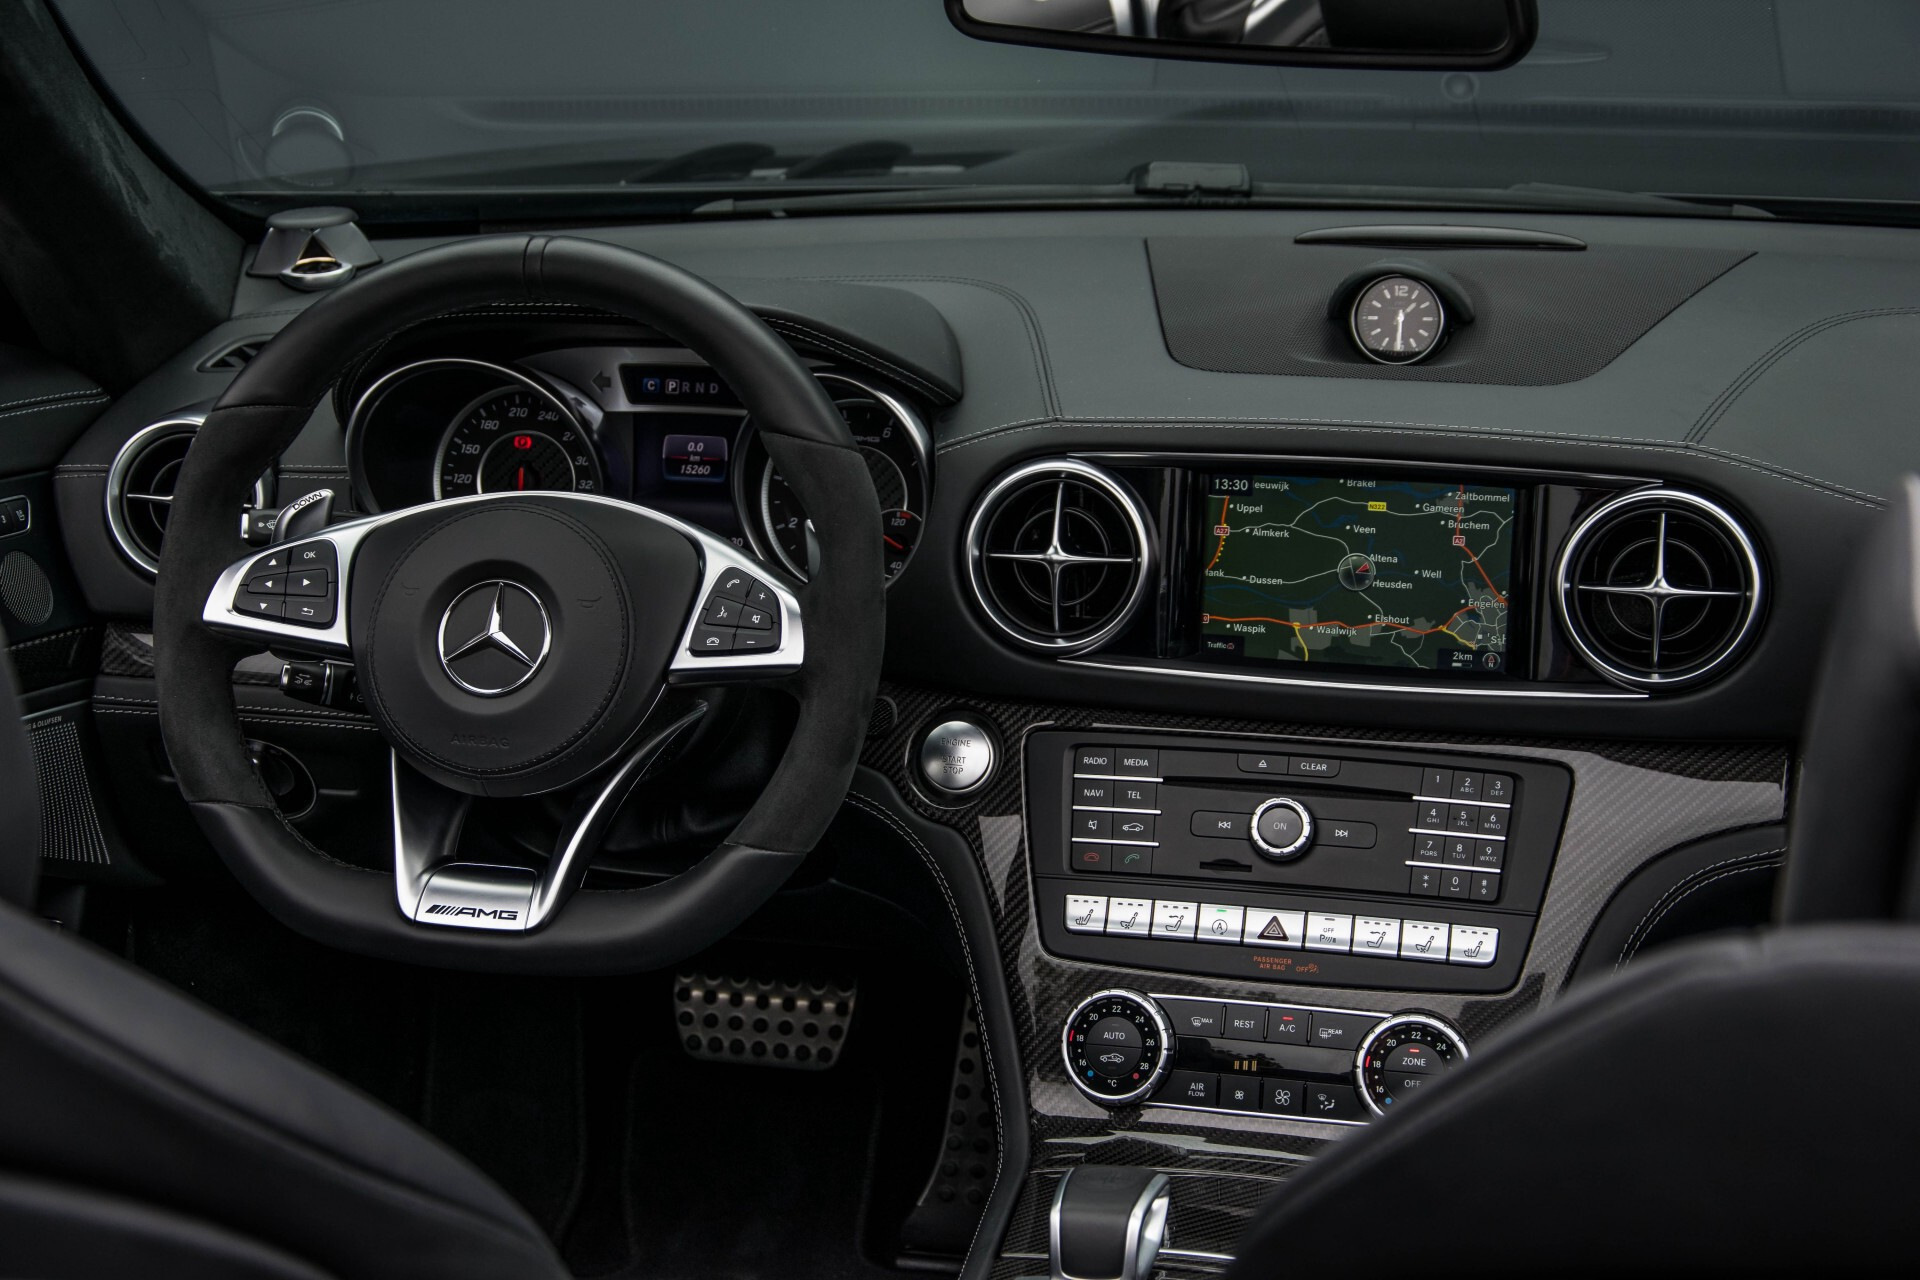 Mercedes-Benz SL-Klasse 63 AMG Keramisch/Bang & Olufsen/Designo/Carbon/Drivers Package Aut7 Foto 7